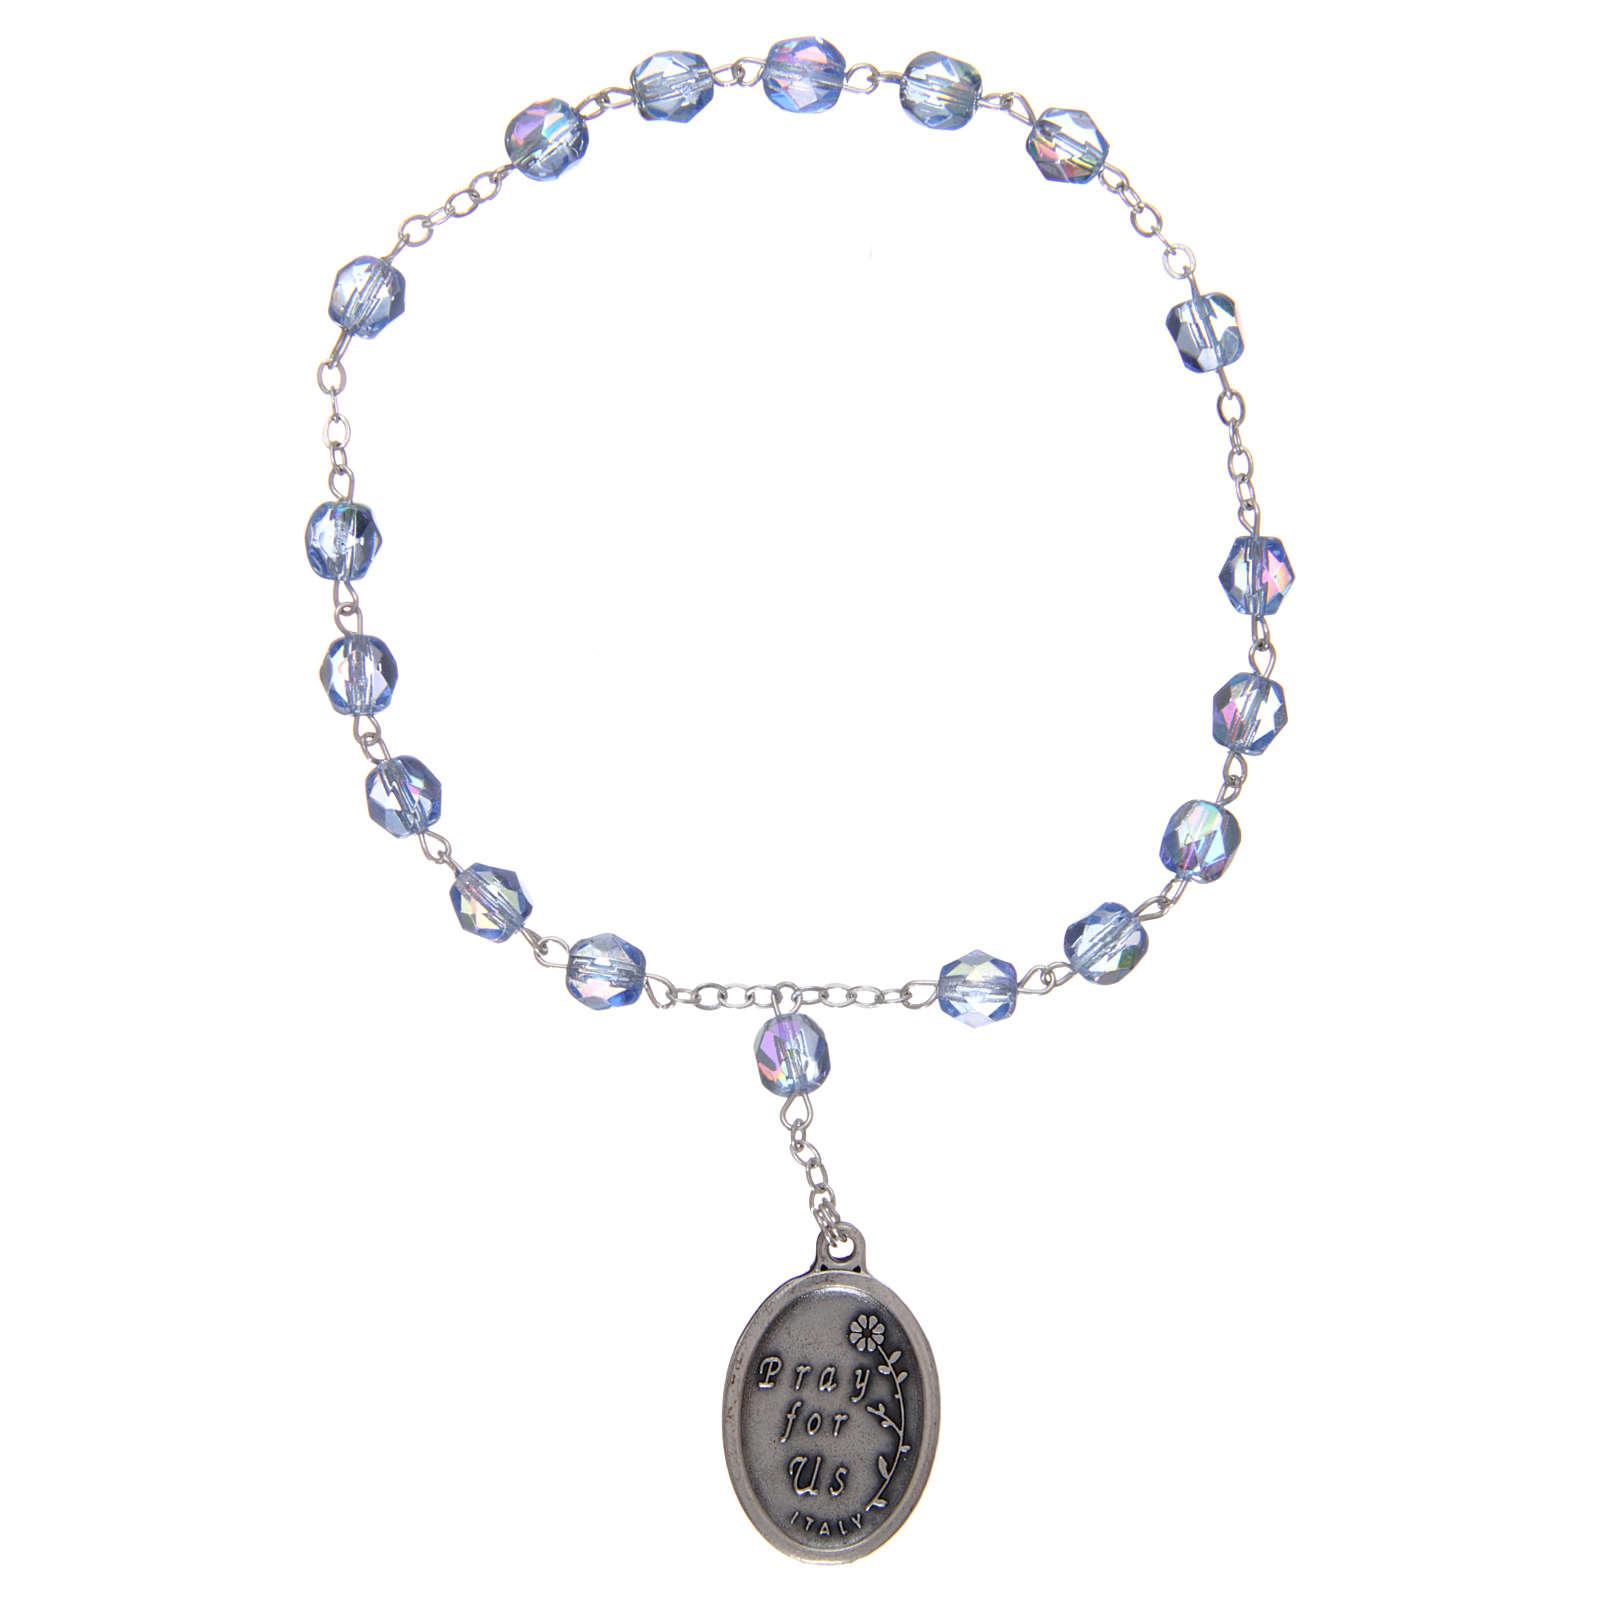 Chapelet semi-cristal Sainte Anne 3 mm bleu clair 4